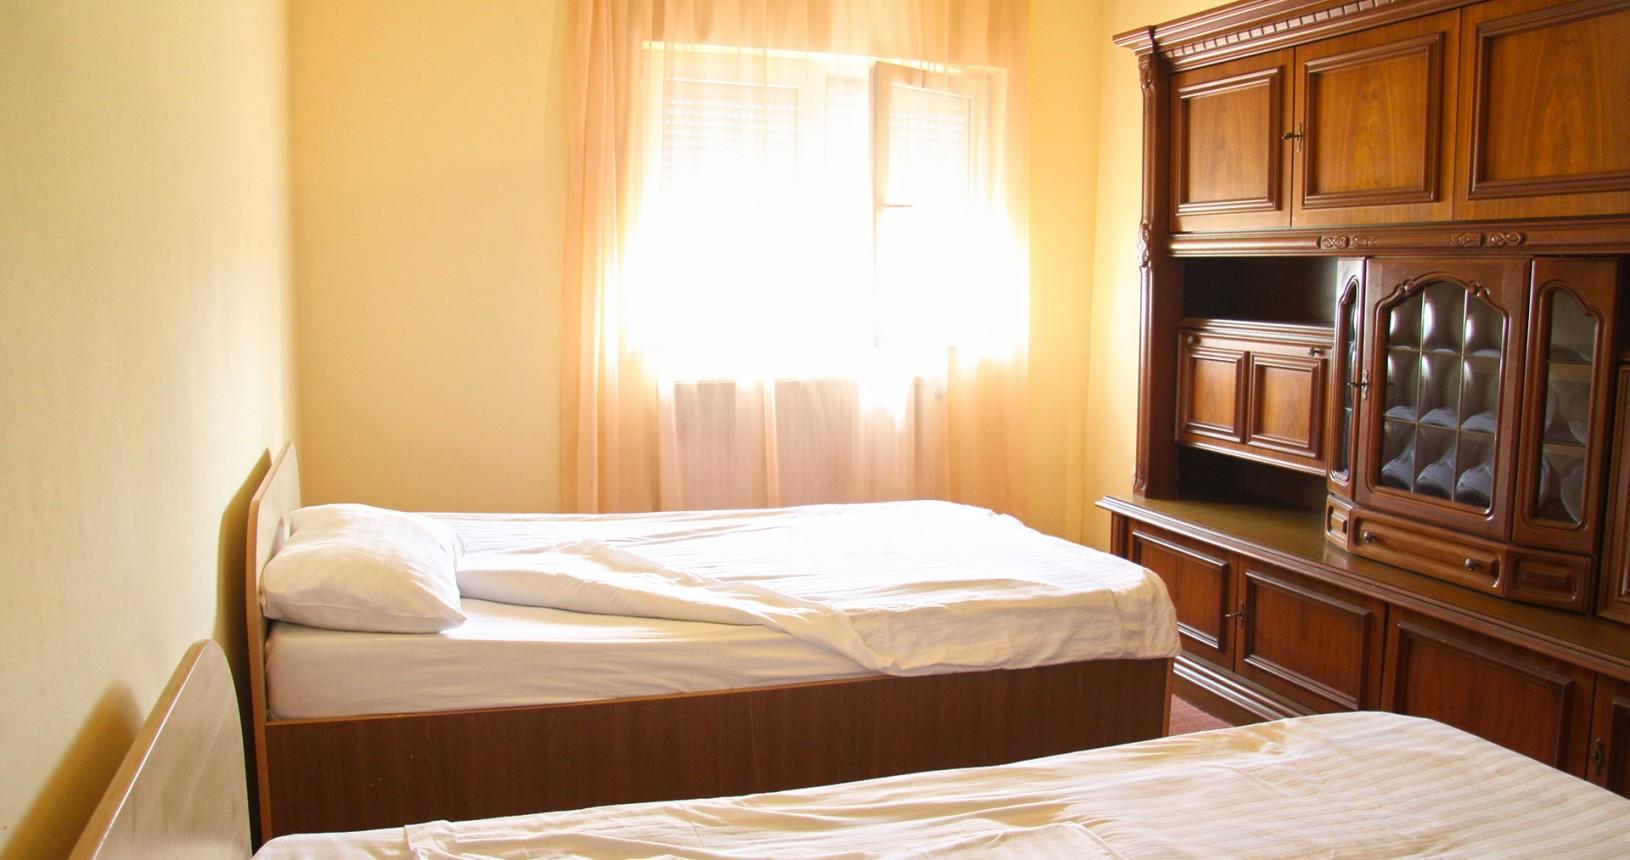 11-apartament-deluxe-hotel-class-oradea